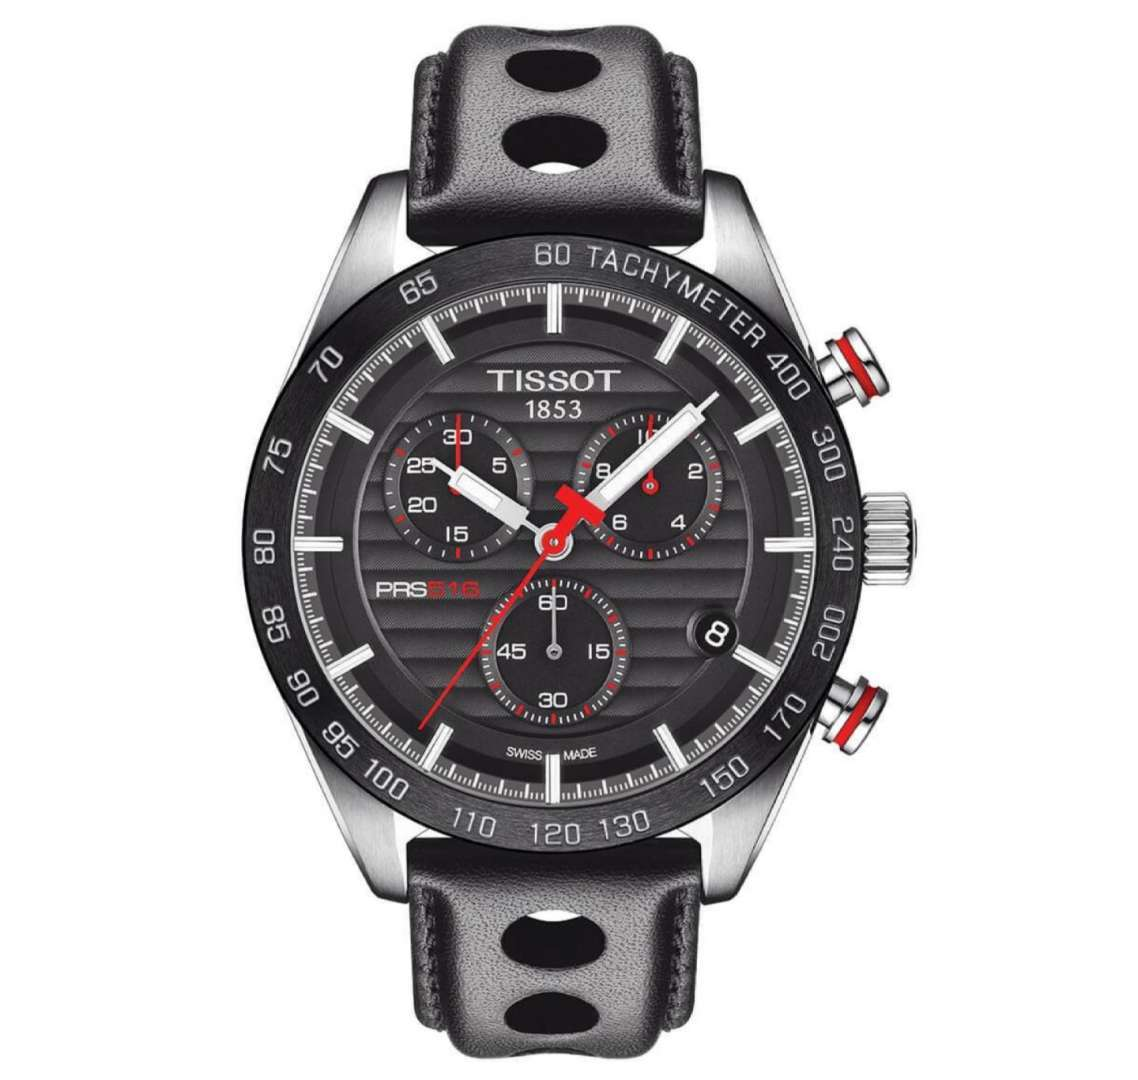 שעון יד אנלוגי tissot t100.417.16.051.00 טיסו